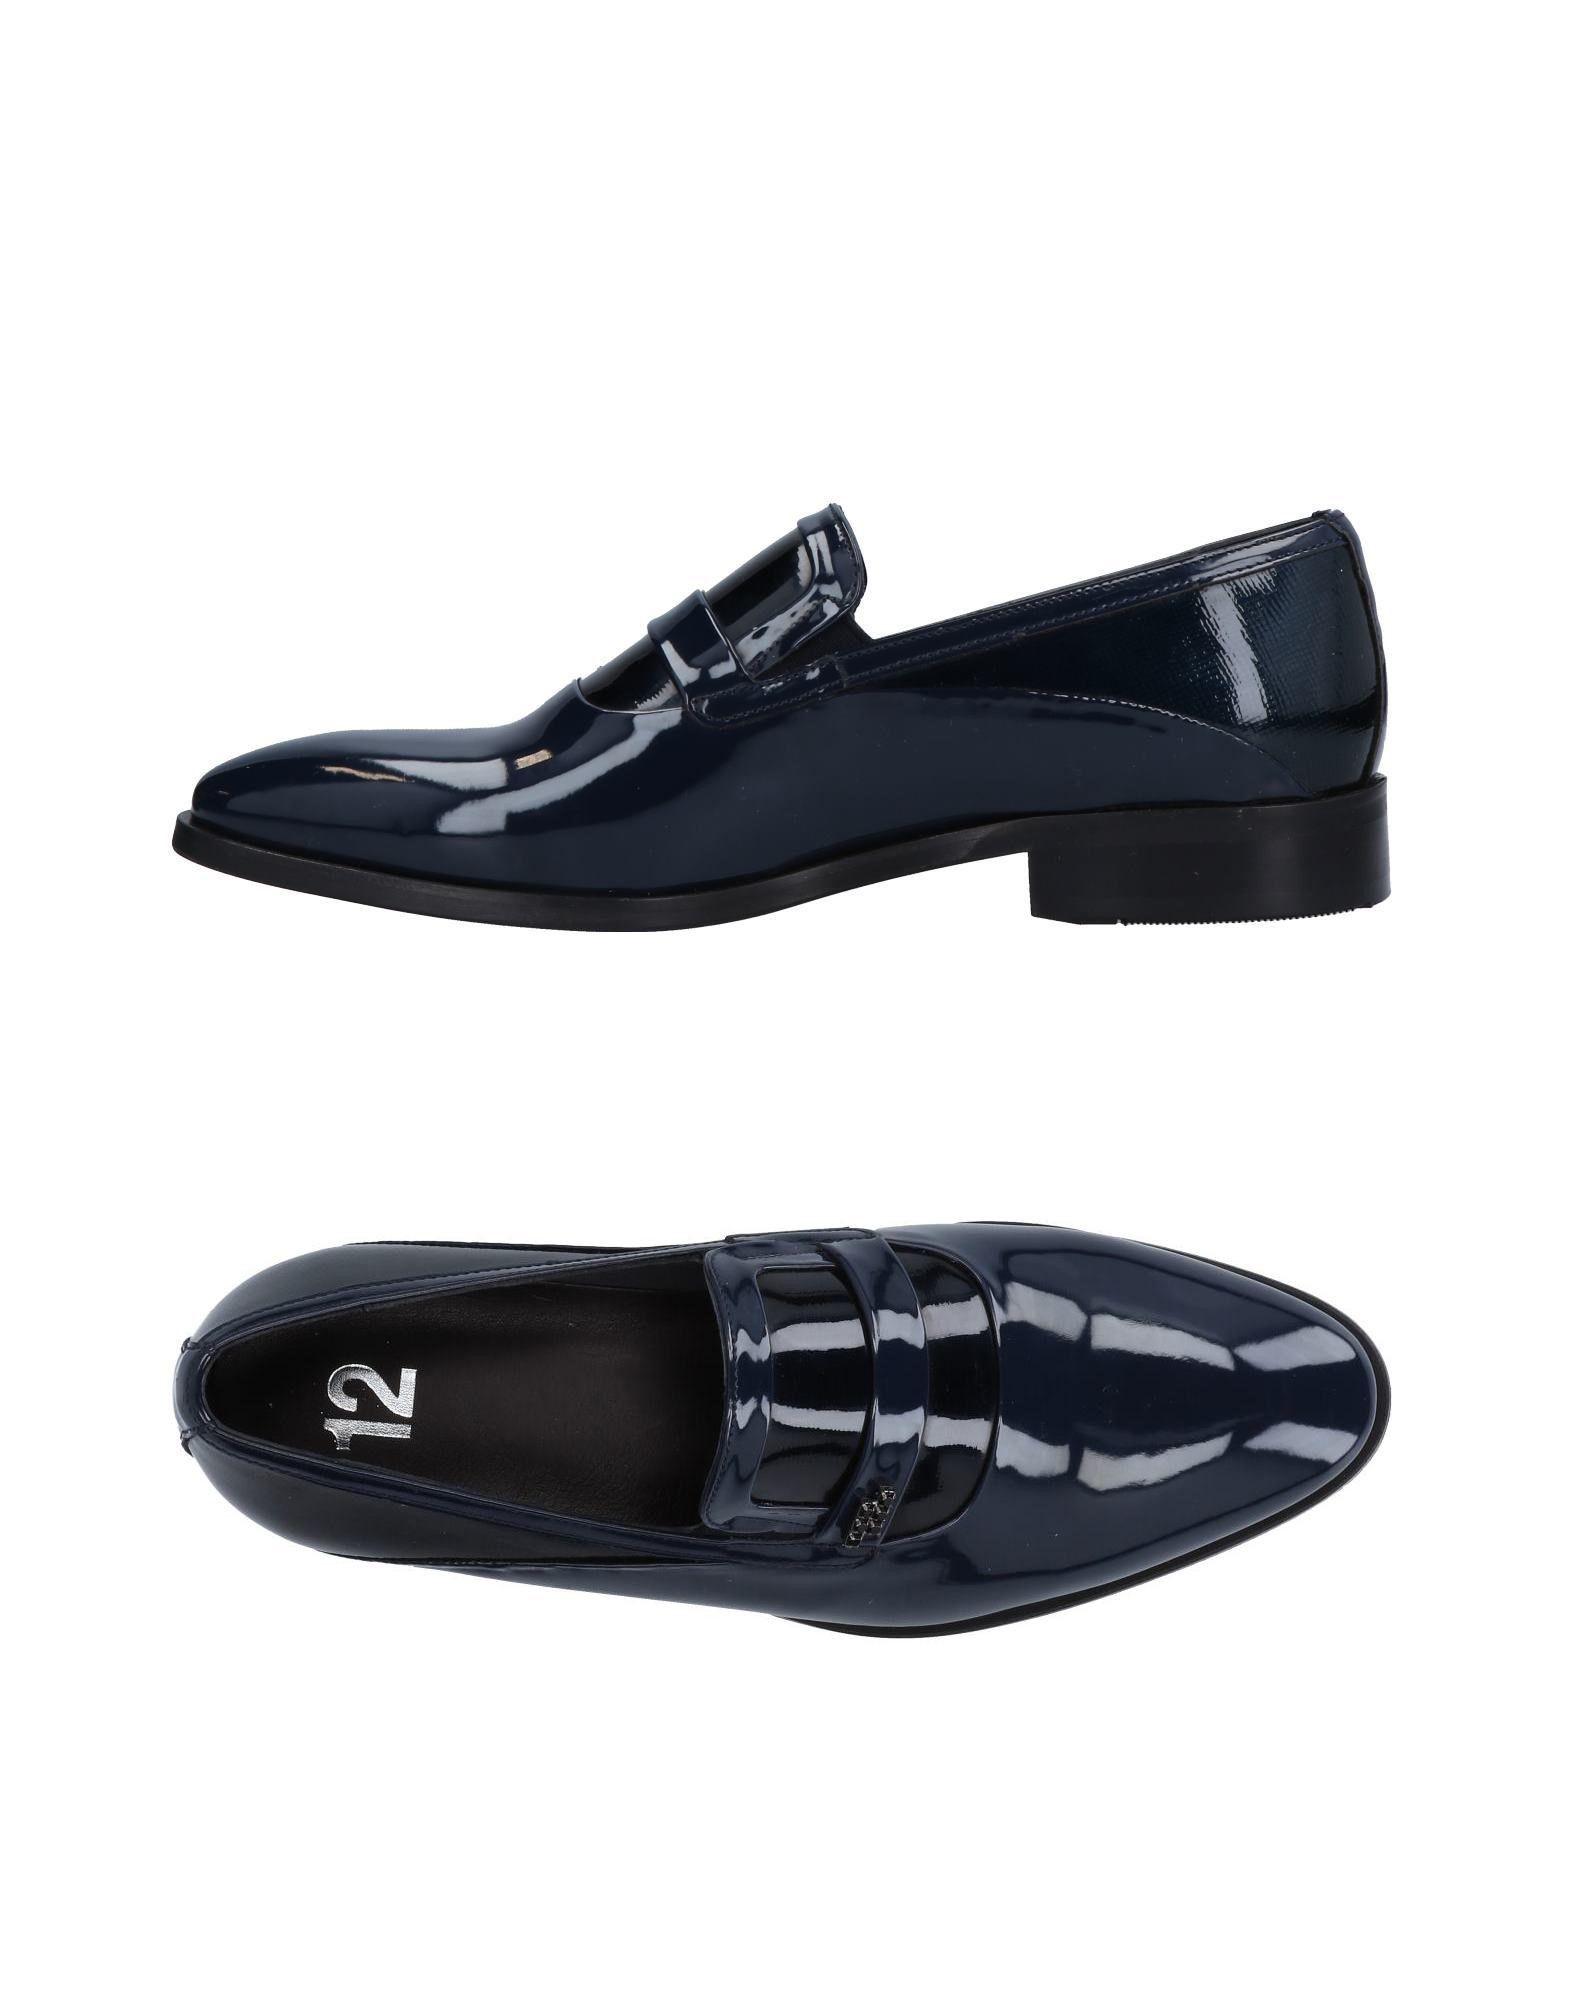 Haltbare Mode billige Schuhe Tsd12 Mokassins Herren  11504098BR Heiße Schuhe